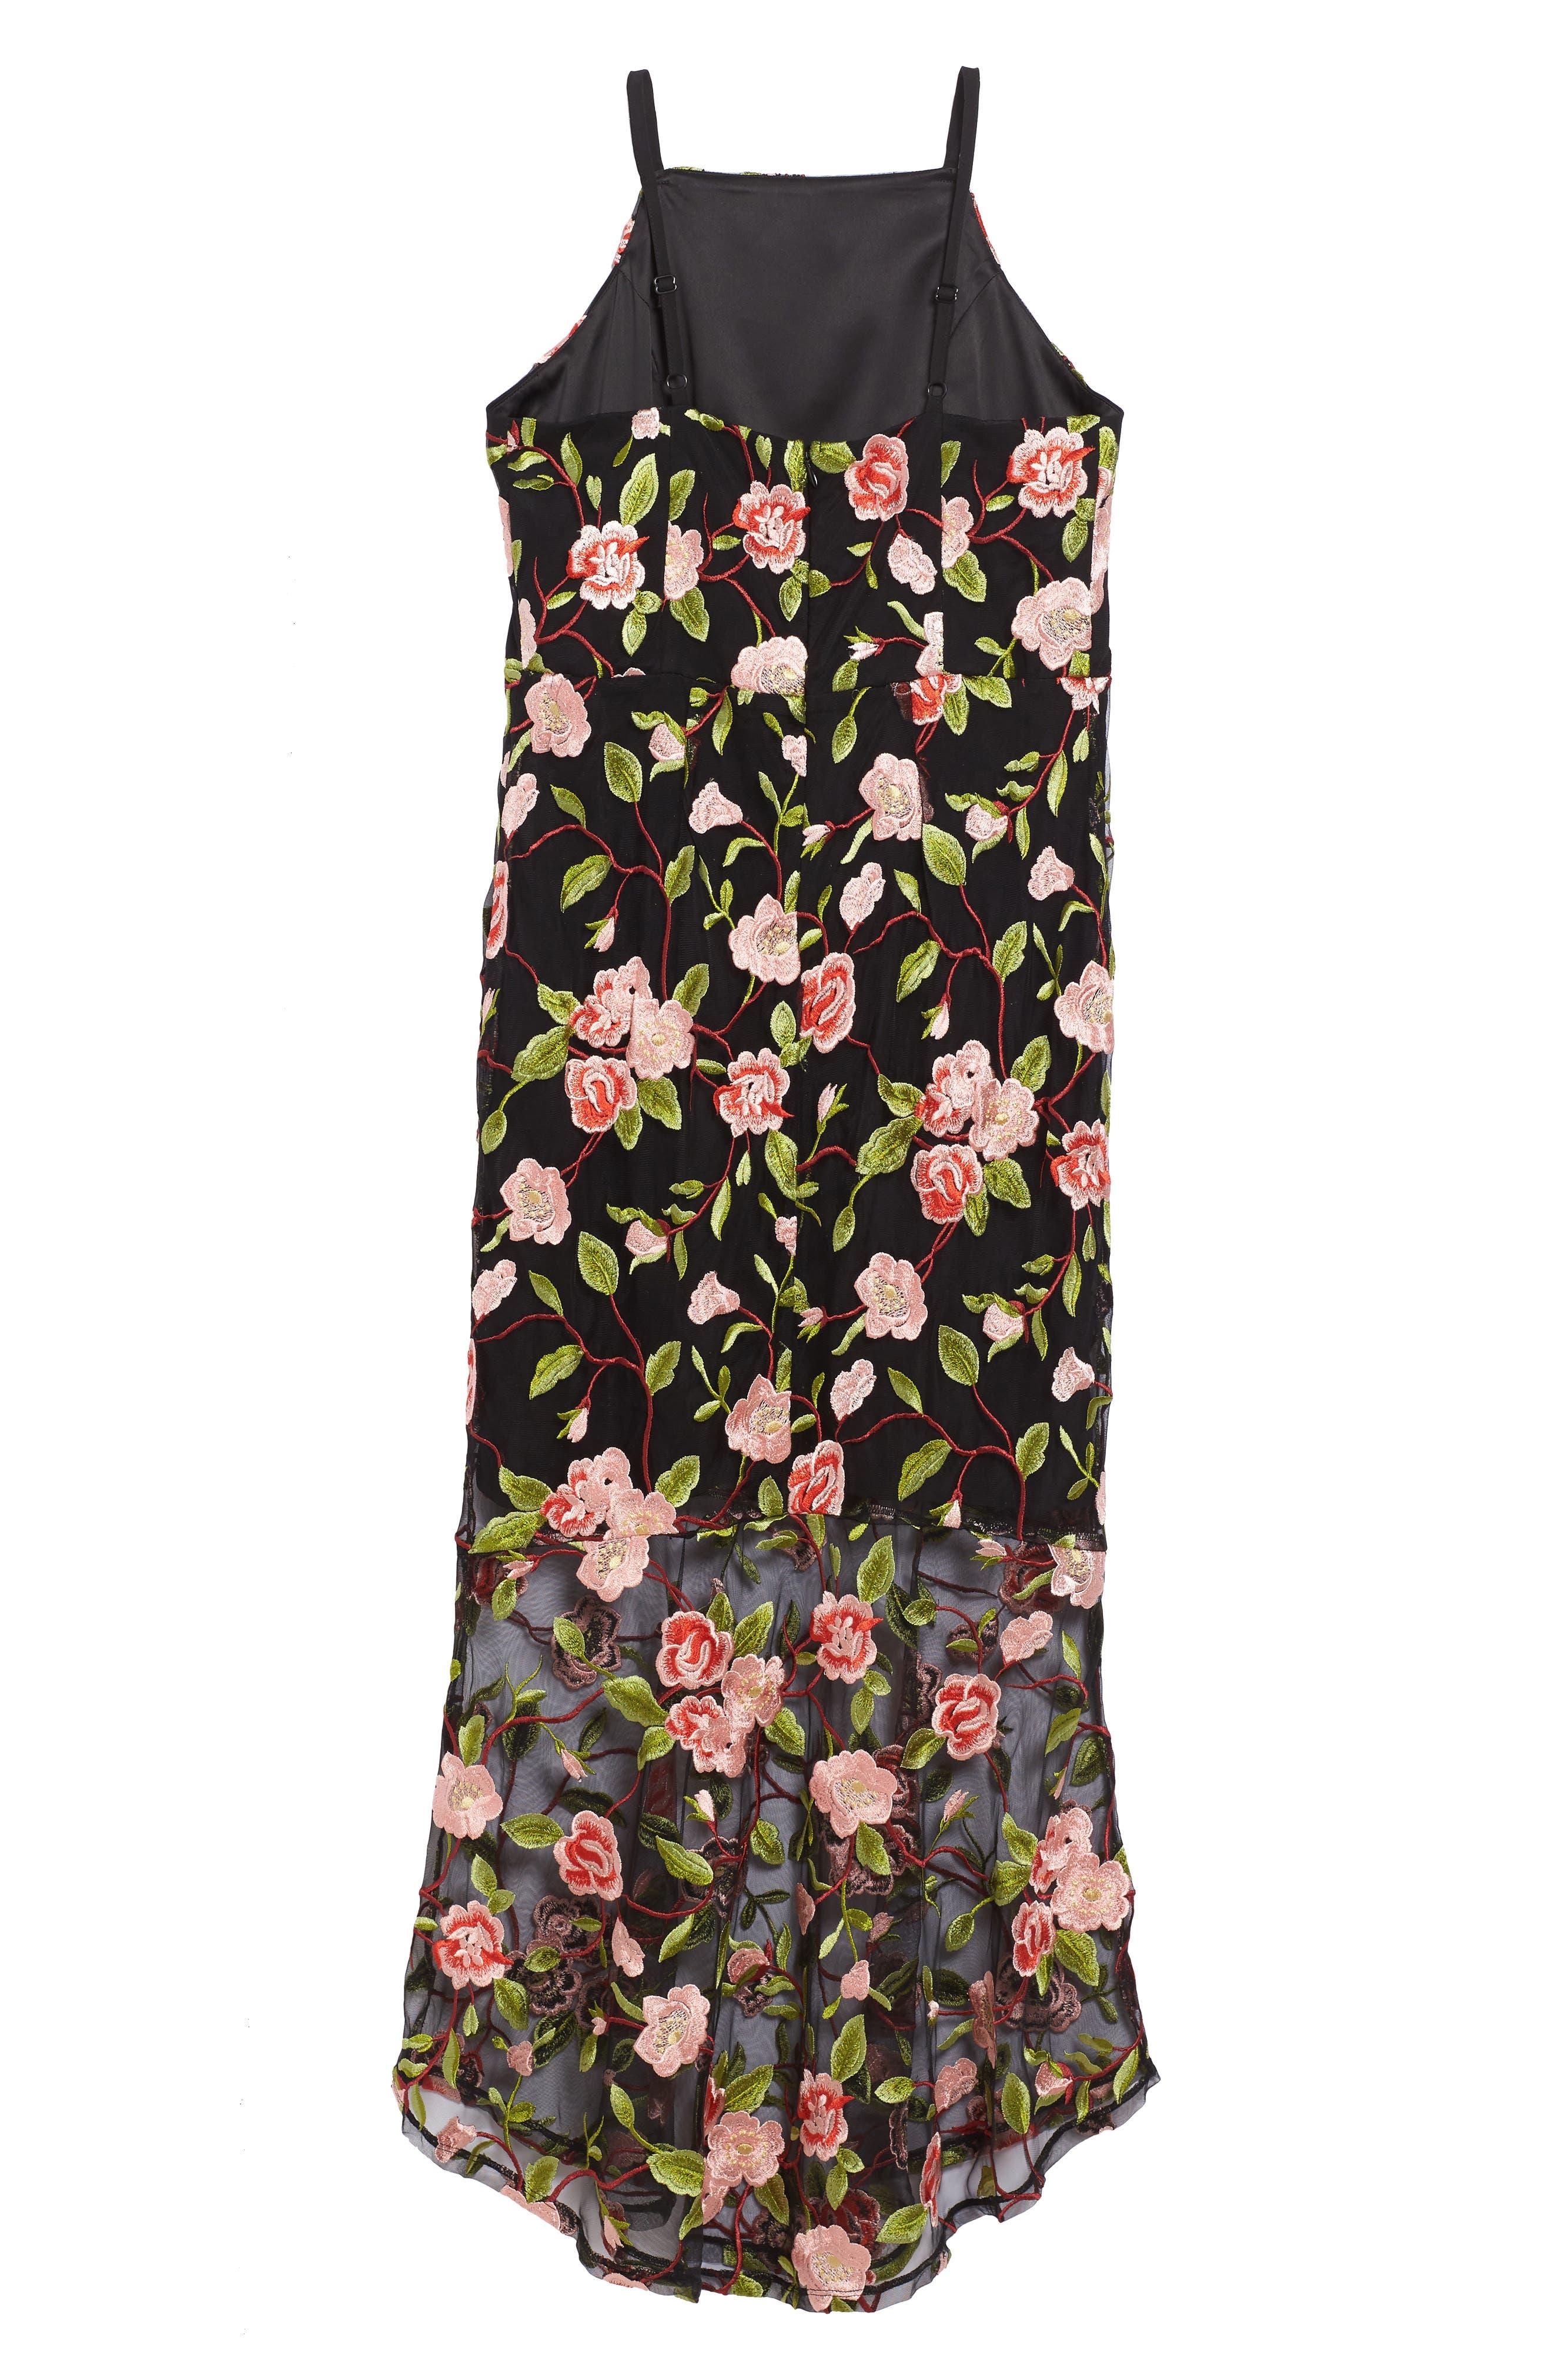 Floral Embroidered Slip Dress,                             Alternate thumbnail 2, color,                             001